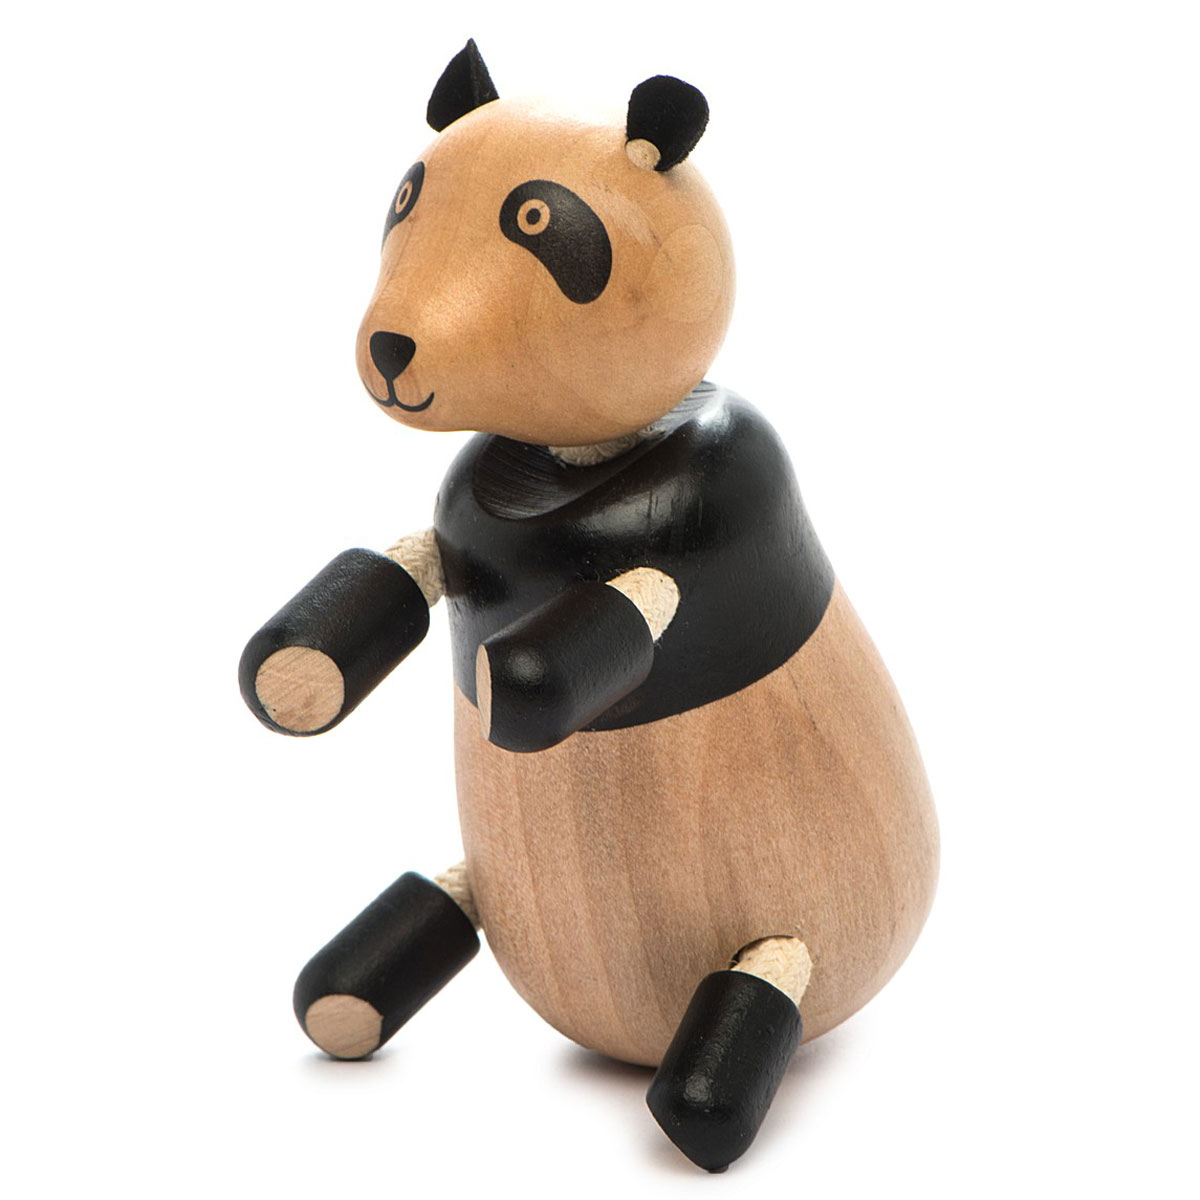 AnaMalz Фигурка деревянная Панда фигурки игрушки anamalz касатик